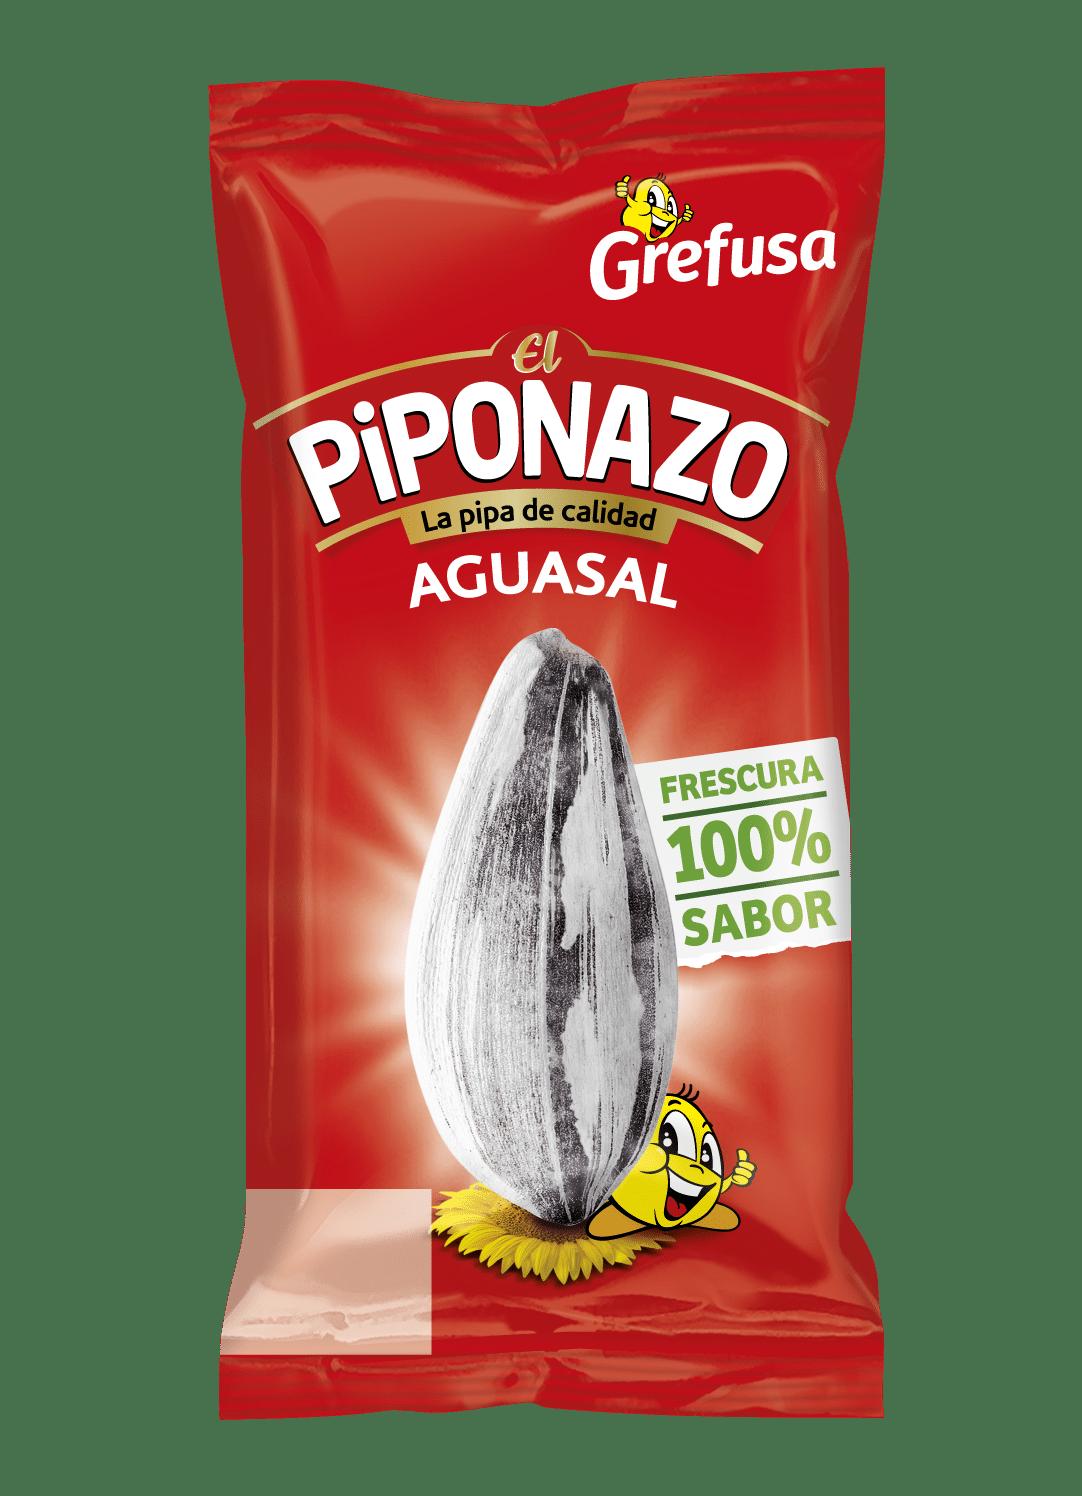 piponazo-aguasal